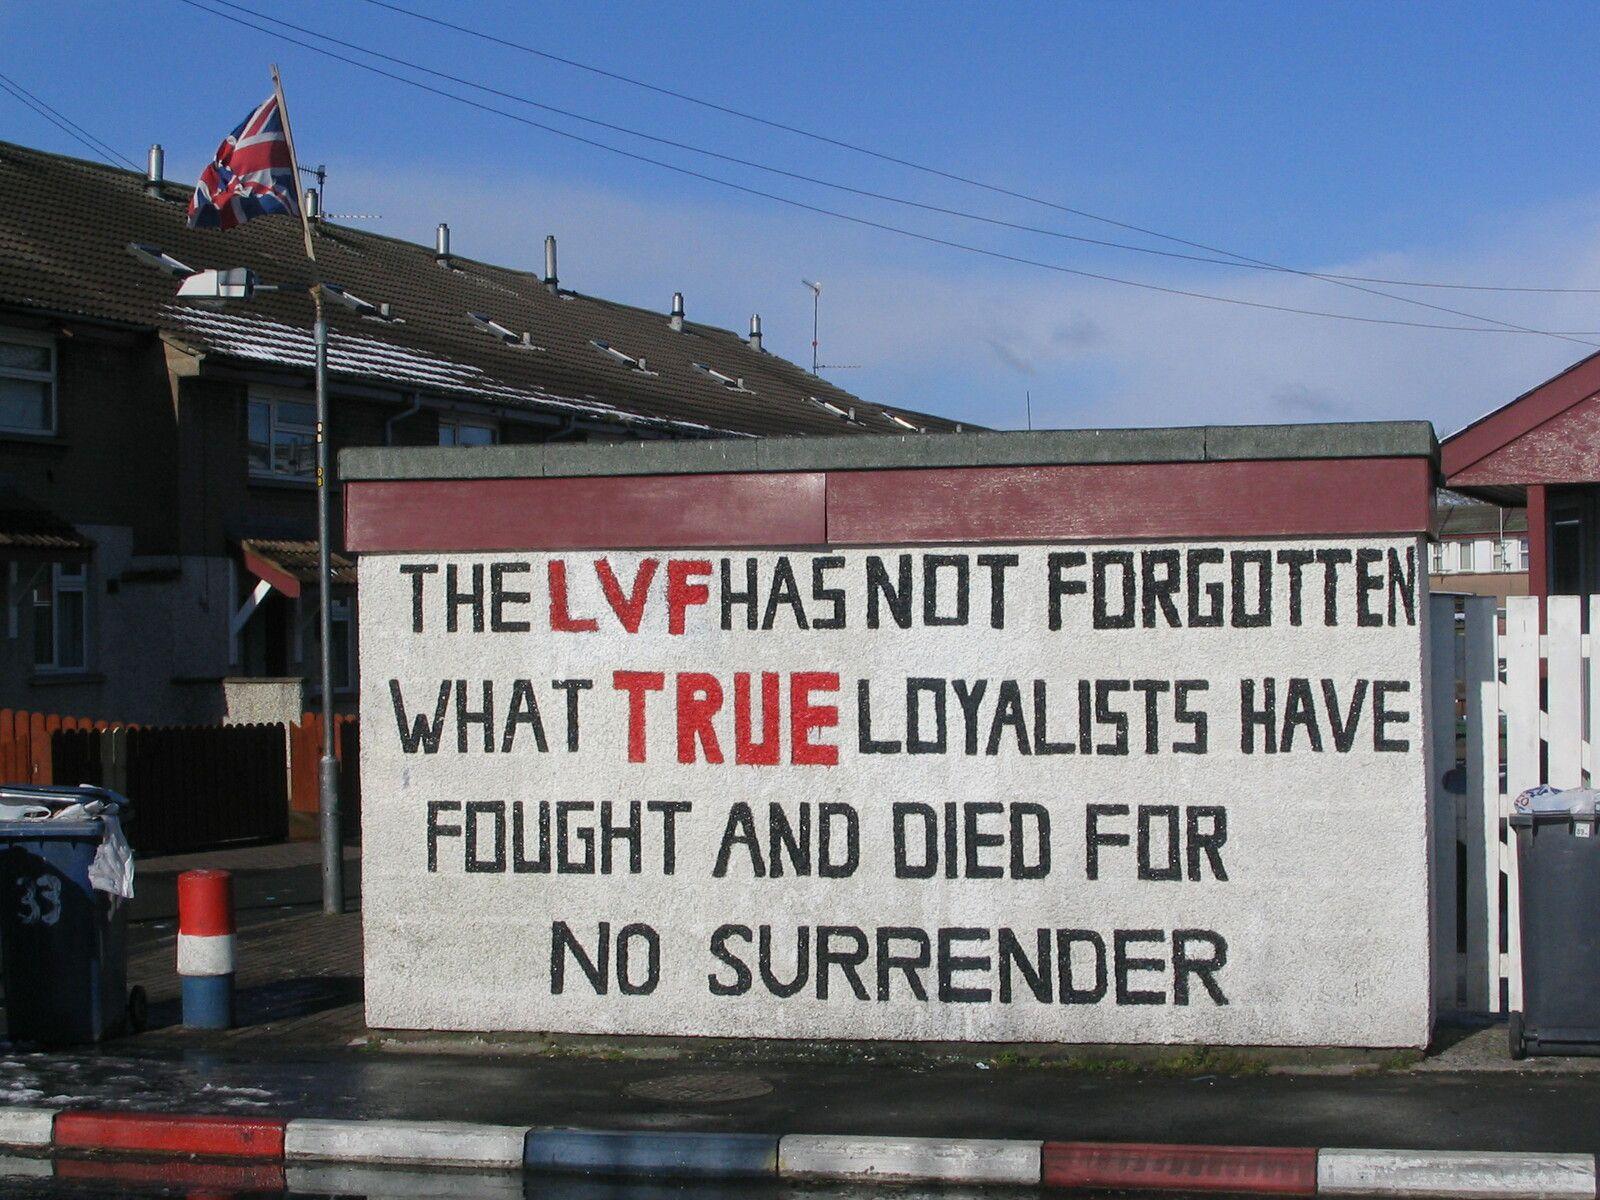 845) Portadown Loyalist